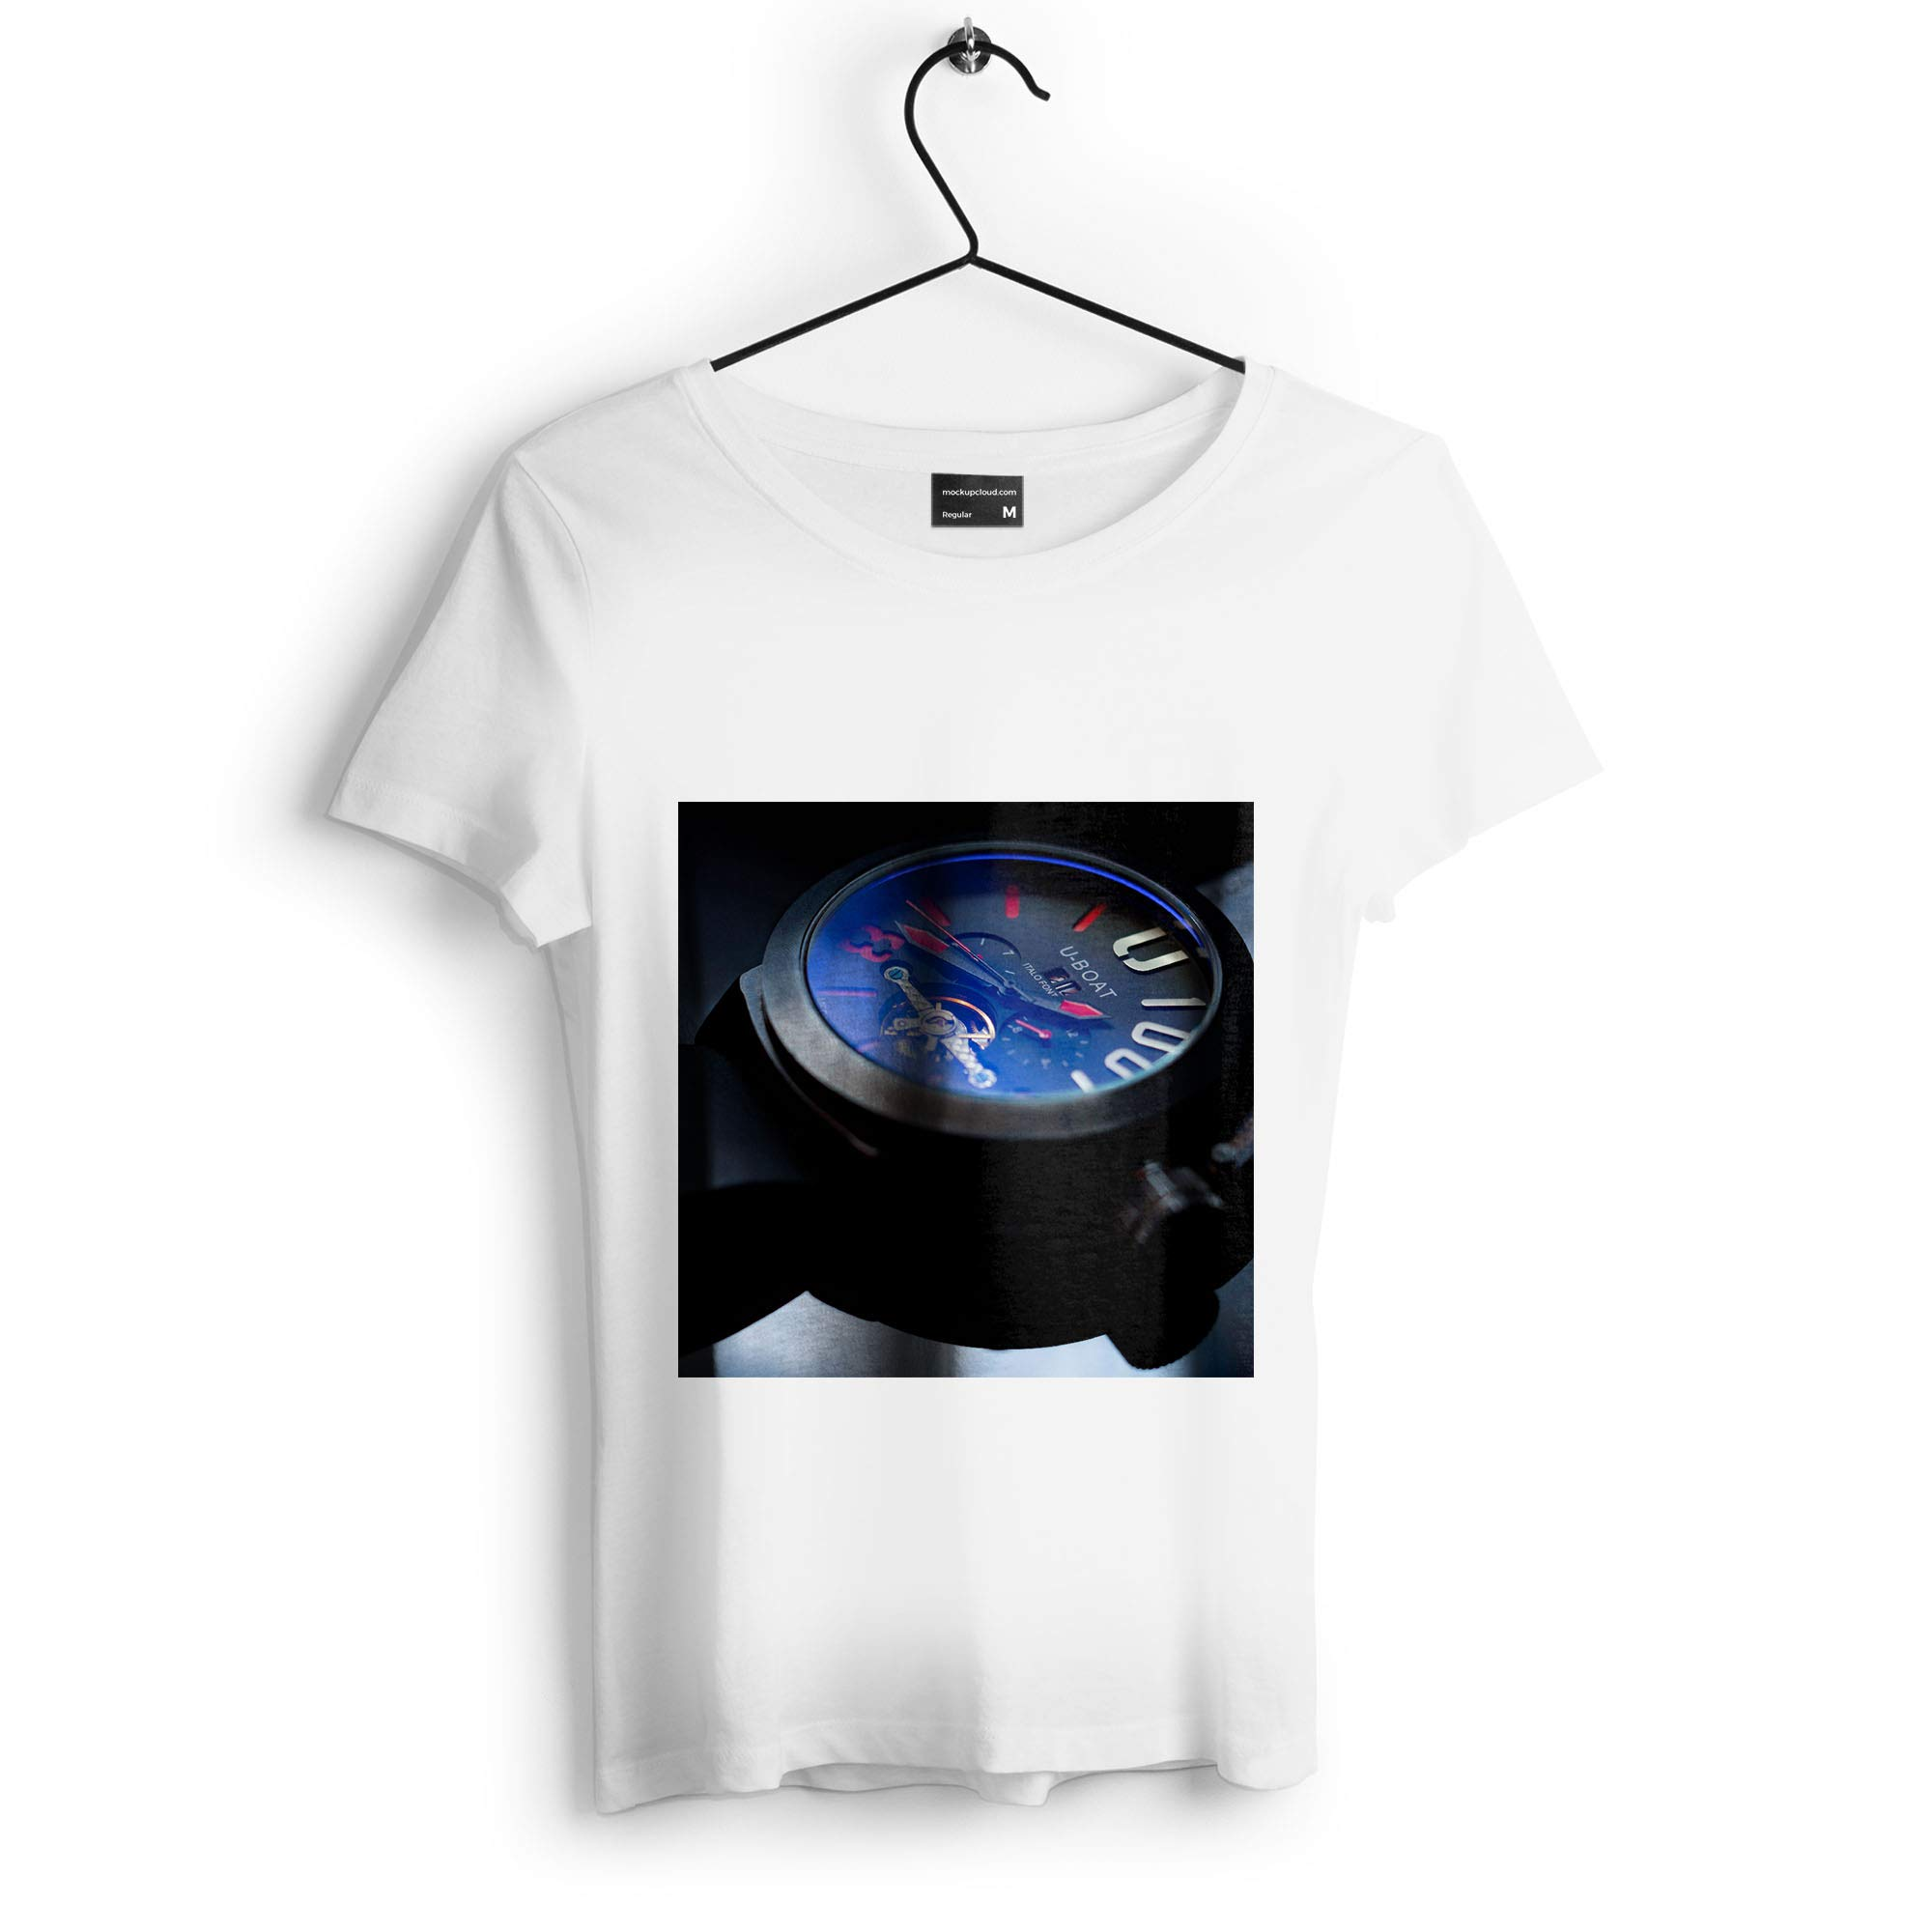 Westlake Art - Watch Product - Unisex Tshirt - Picture Photography Artwork Shirt - White Adult Medium (D41D8)